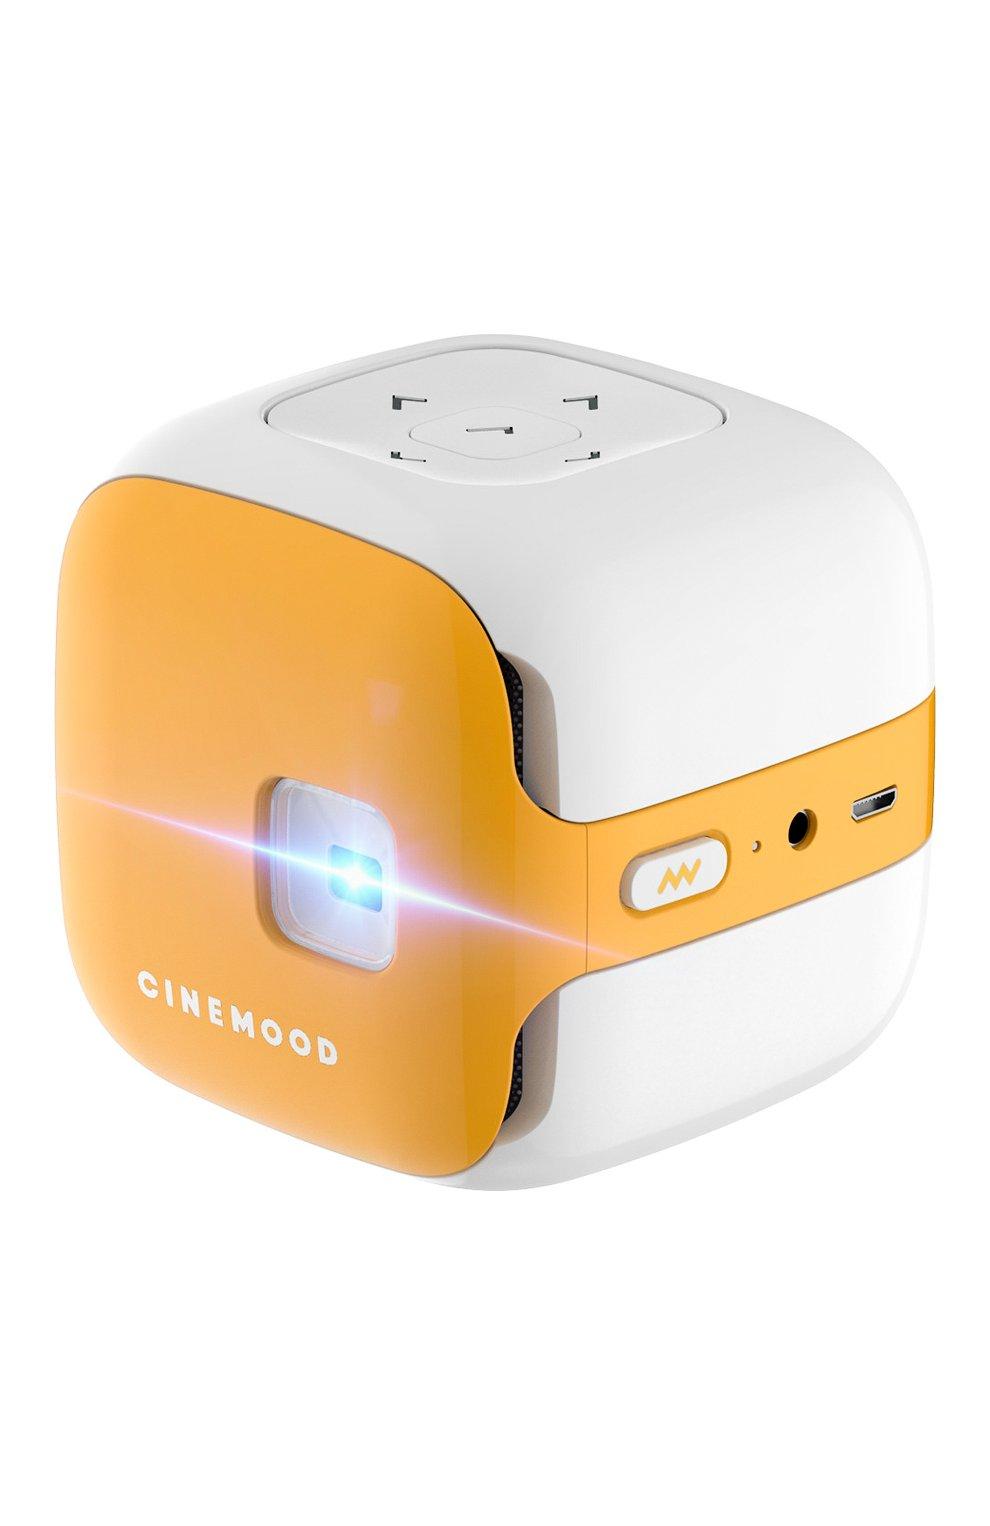 Портативный проектор диакубик 3м draft CINEMOOD белого цвета, арт. CNMD0016LE-3M   Фото 1